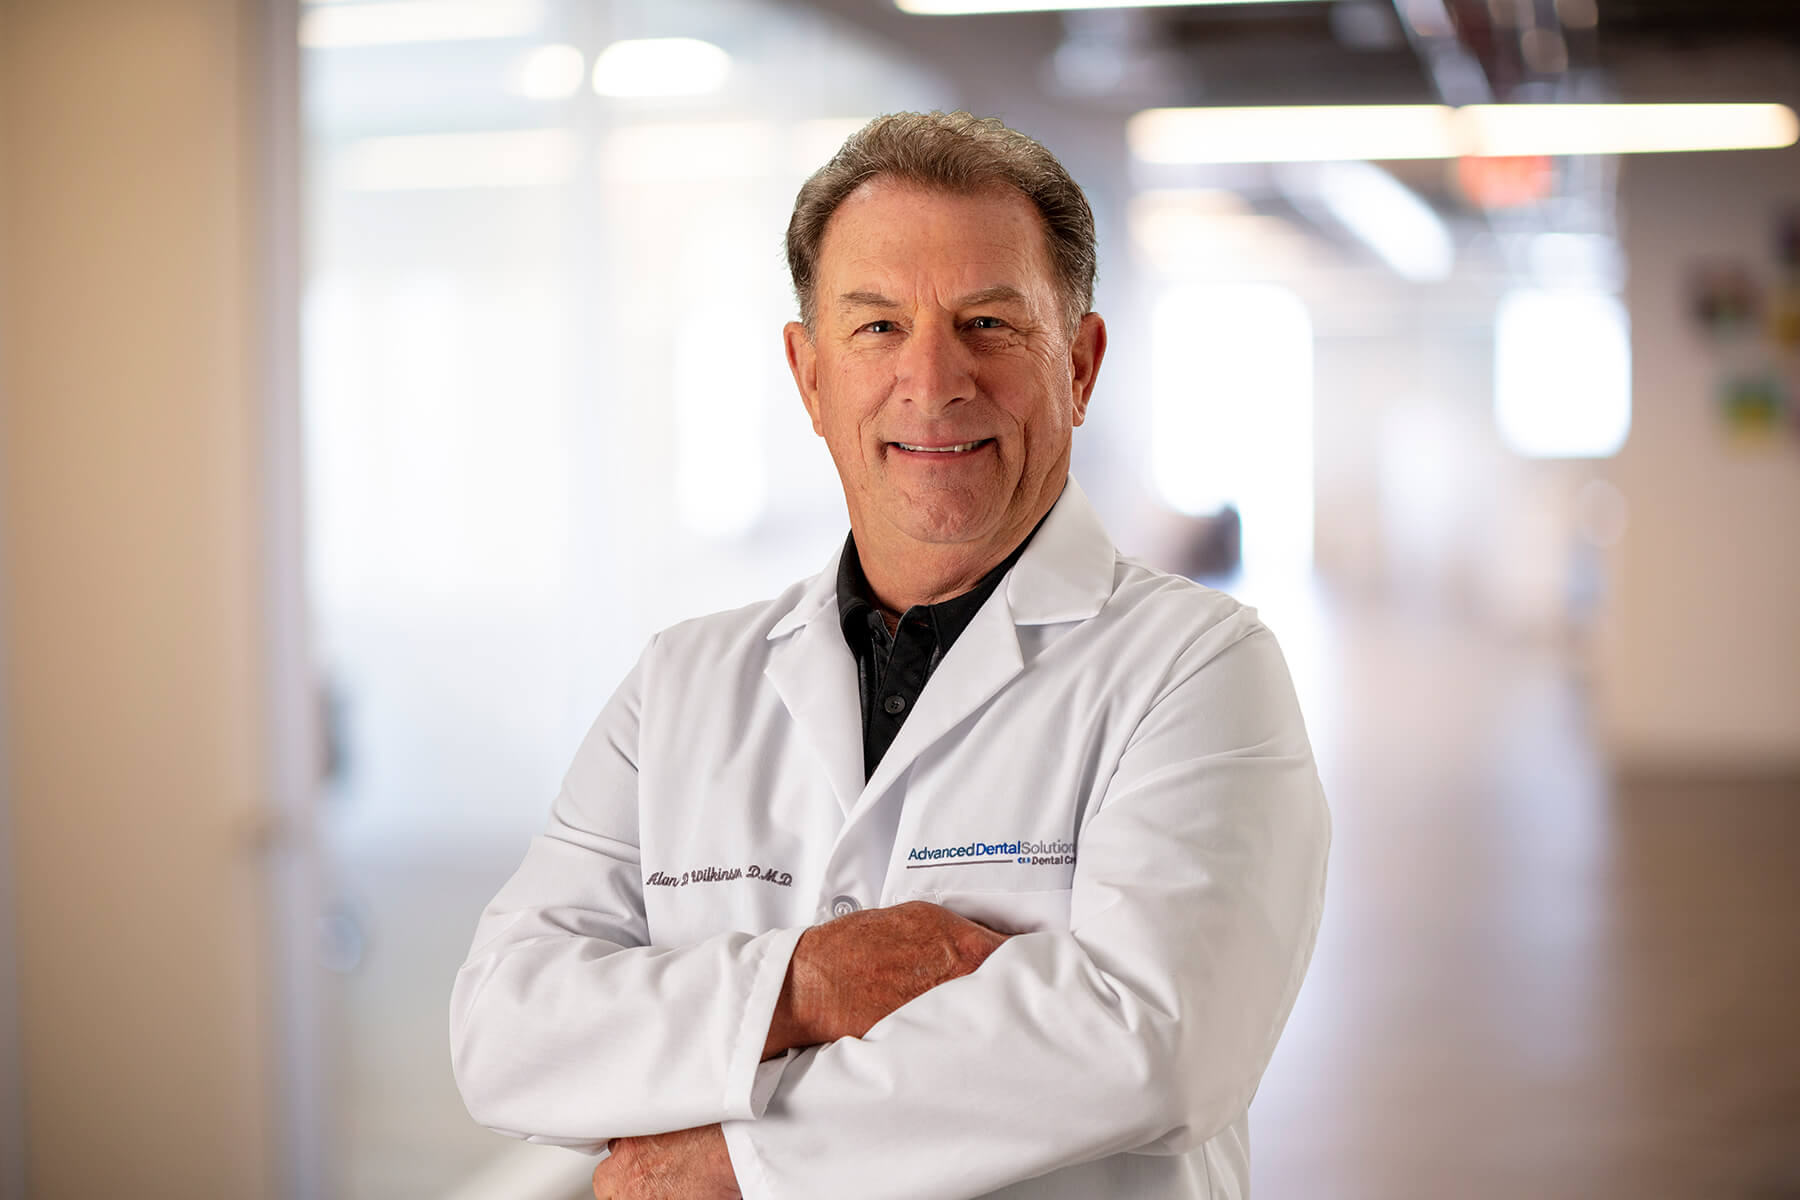 Dr. Alan Wilkinson